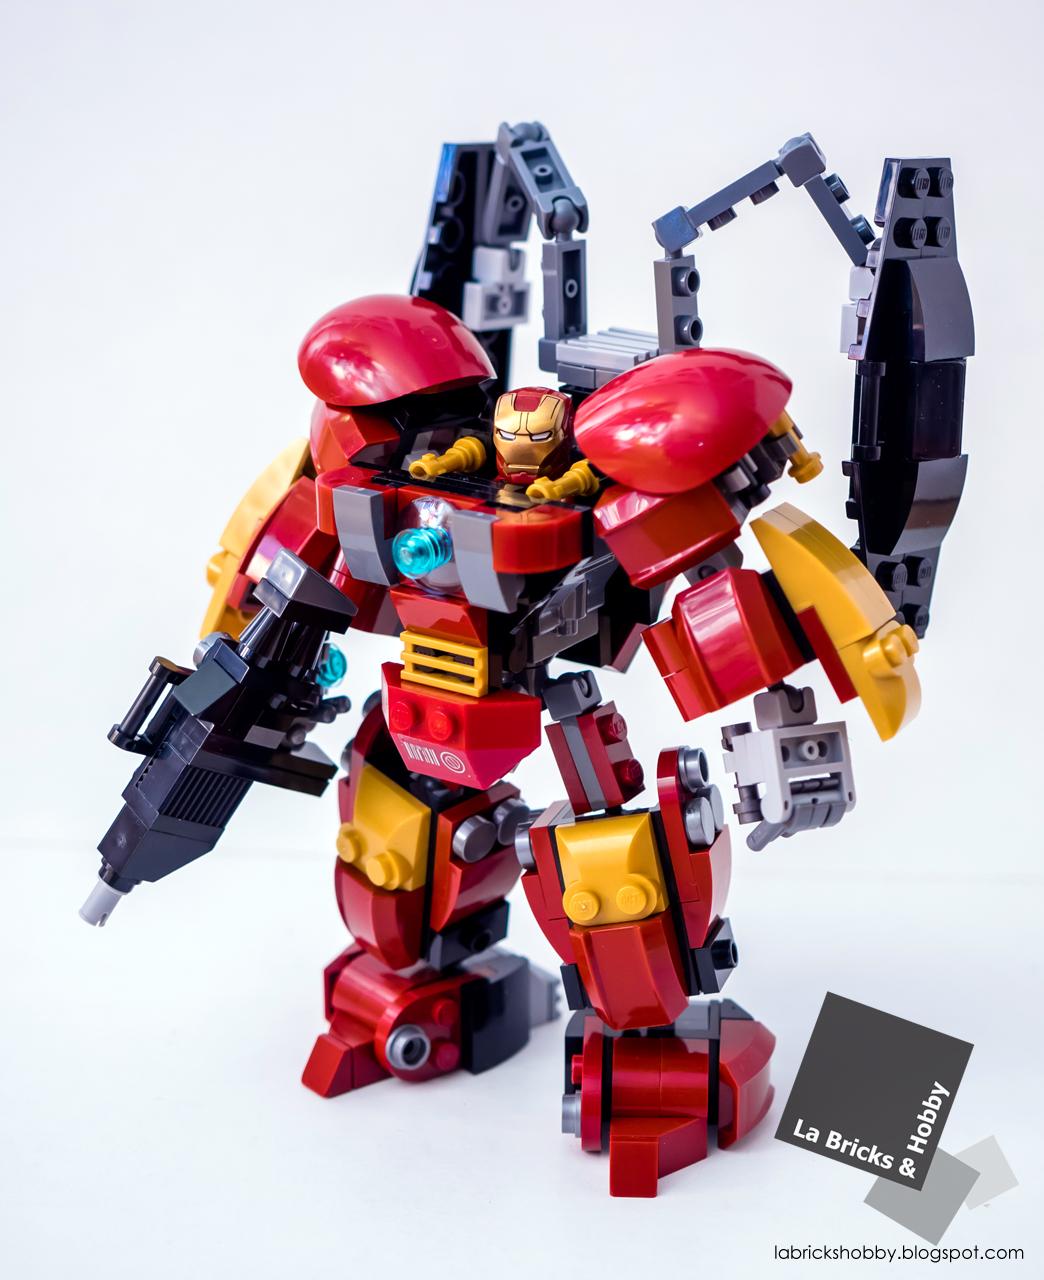 La Bricks & Hobby: LEGO Iron Man Armor's Weapon Addition (MOC)